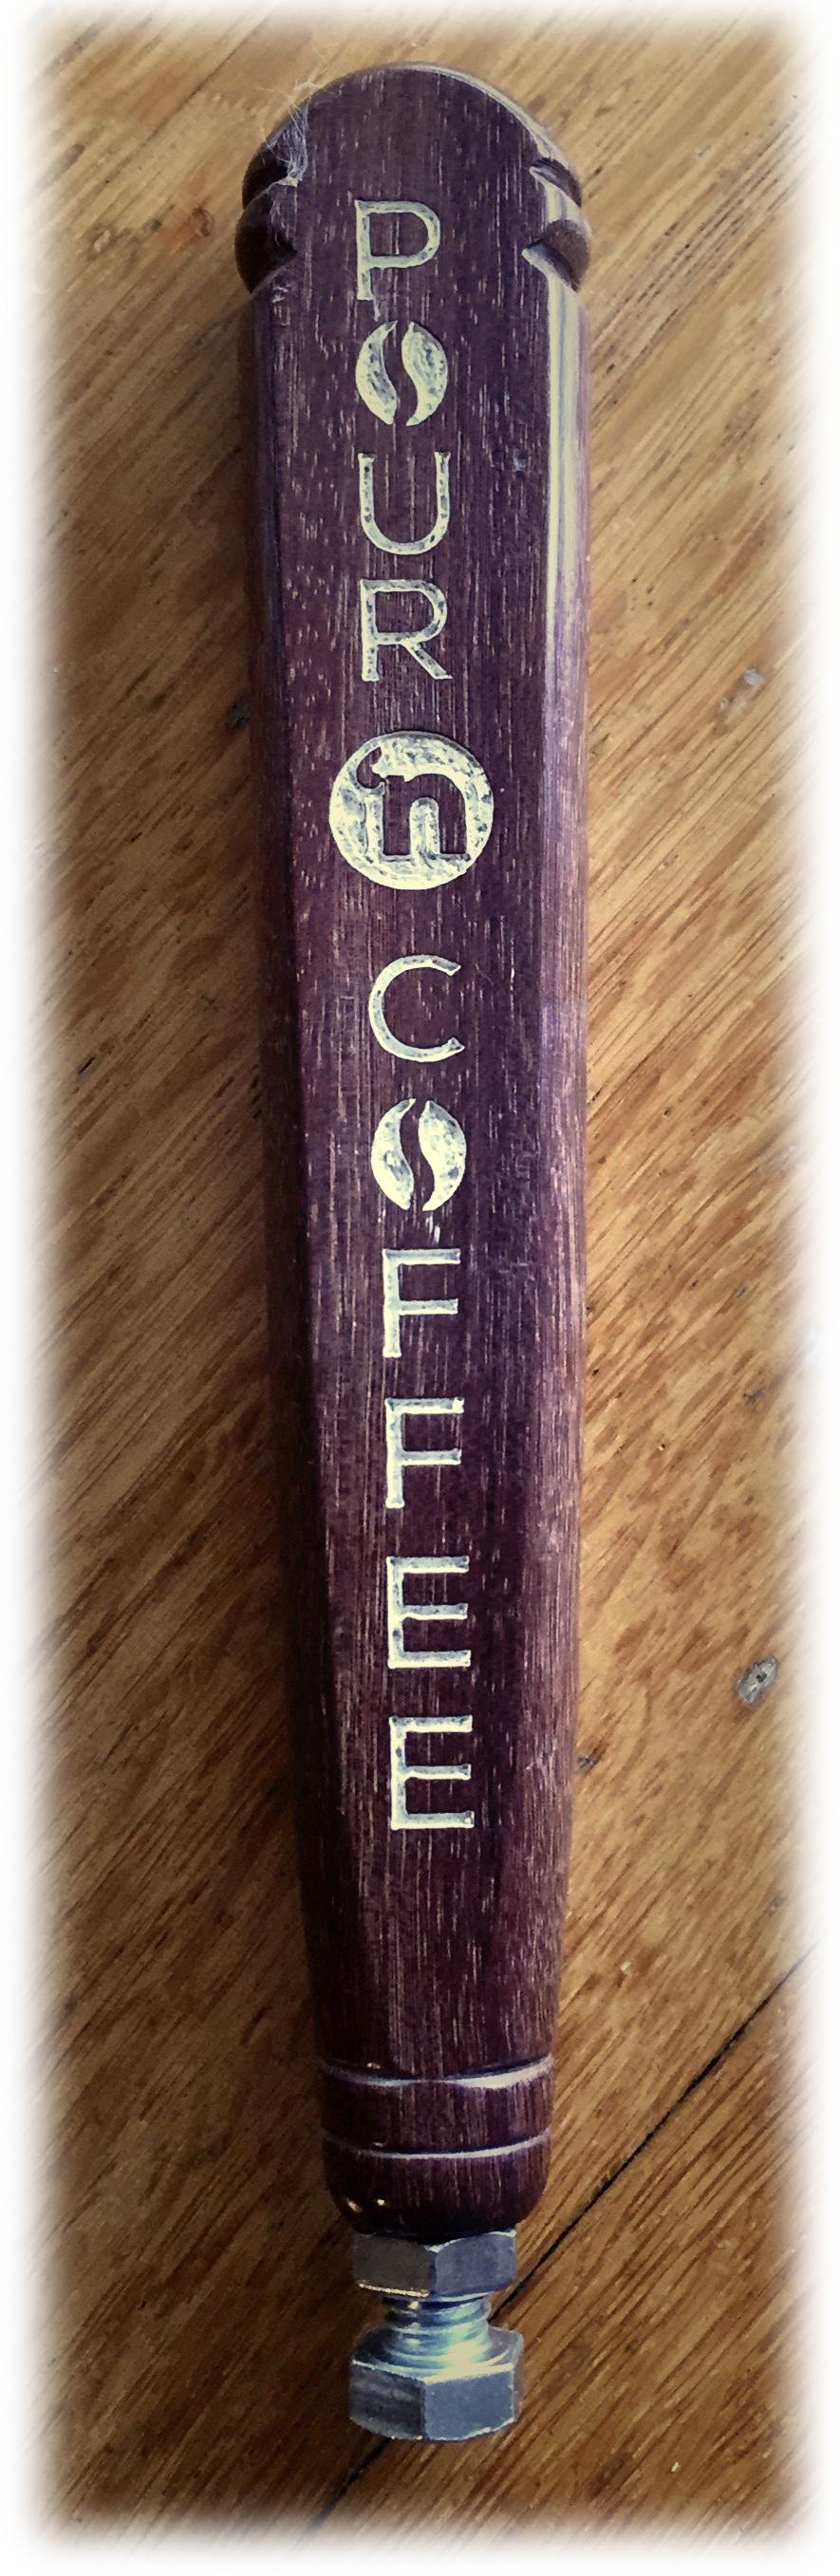 "Purpleheart<p><font size=""-4""><a href=""http://www.pourncoffee.com/"">Pour 'n Coffee</a></font></p>"